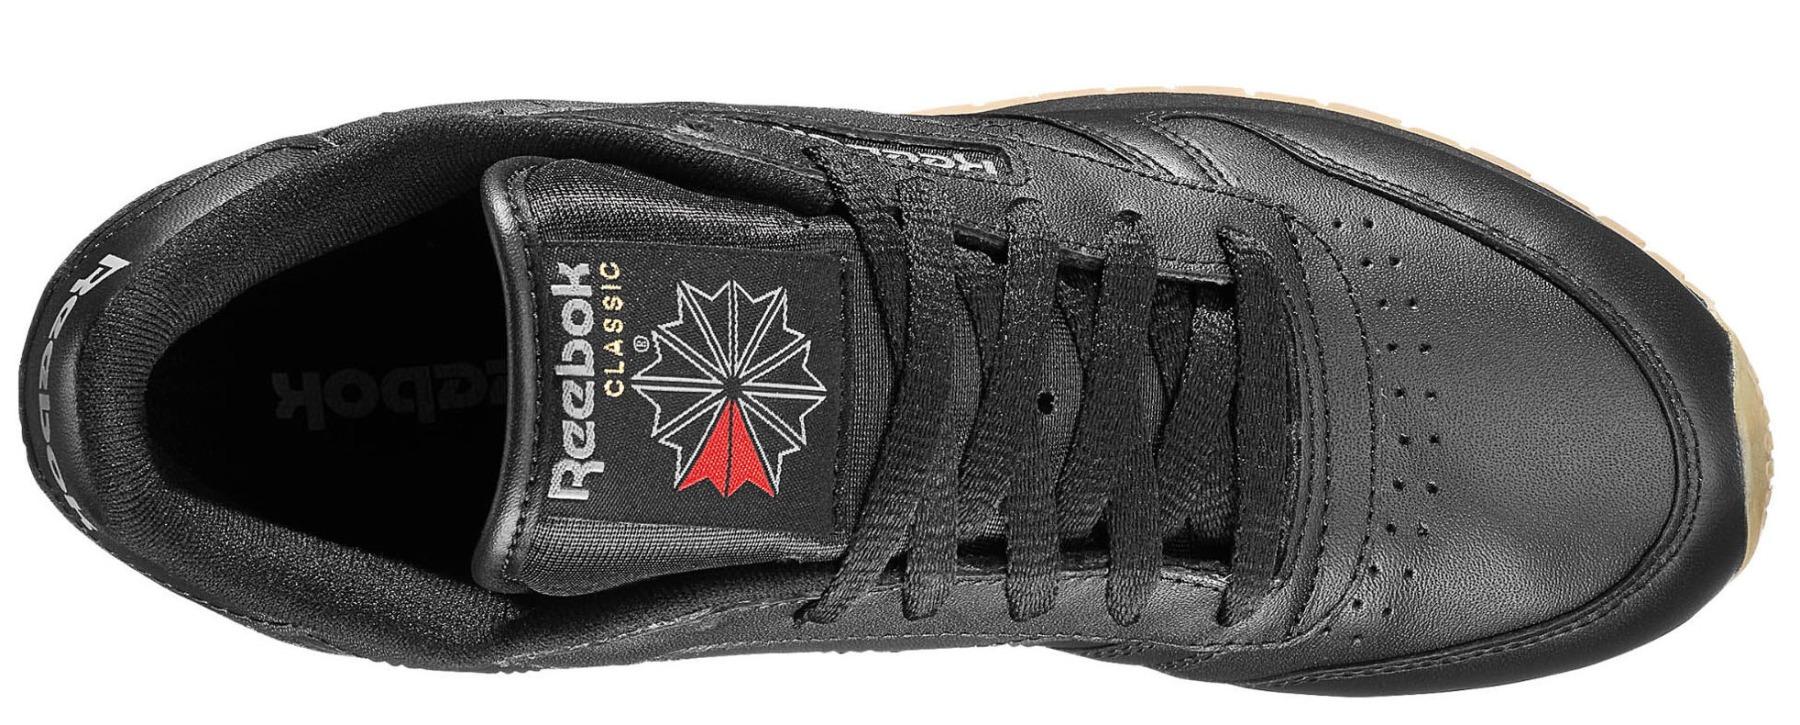 Кроссовки Оригинал Reebok Classic Leather (49804) A1416 – купить по ... fbd5c3430c8